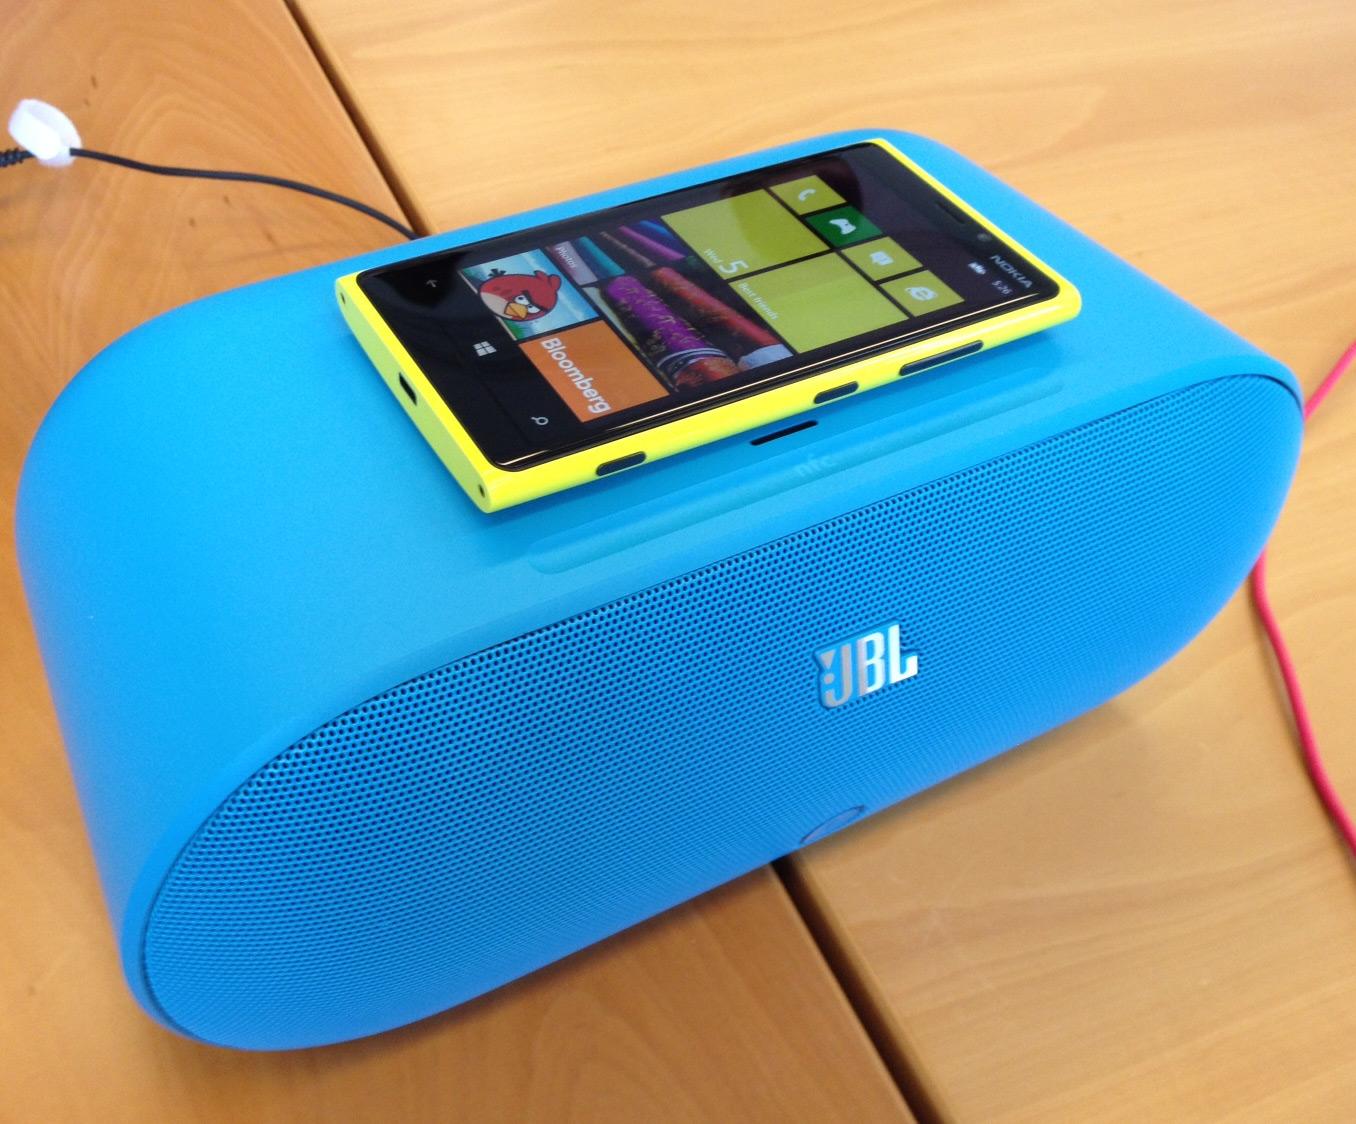 new mobile phone photos nokia lumia 920 windows mobile. Black Bedroom Furniture Sets. Home Design Ideas